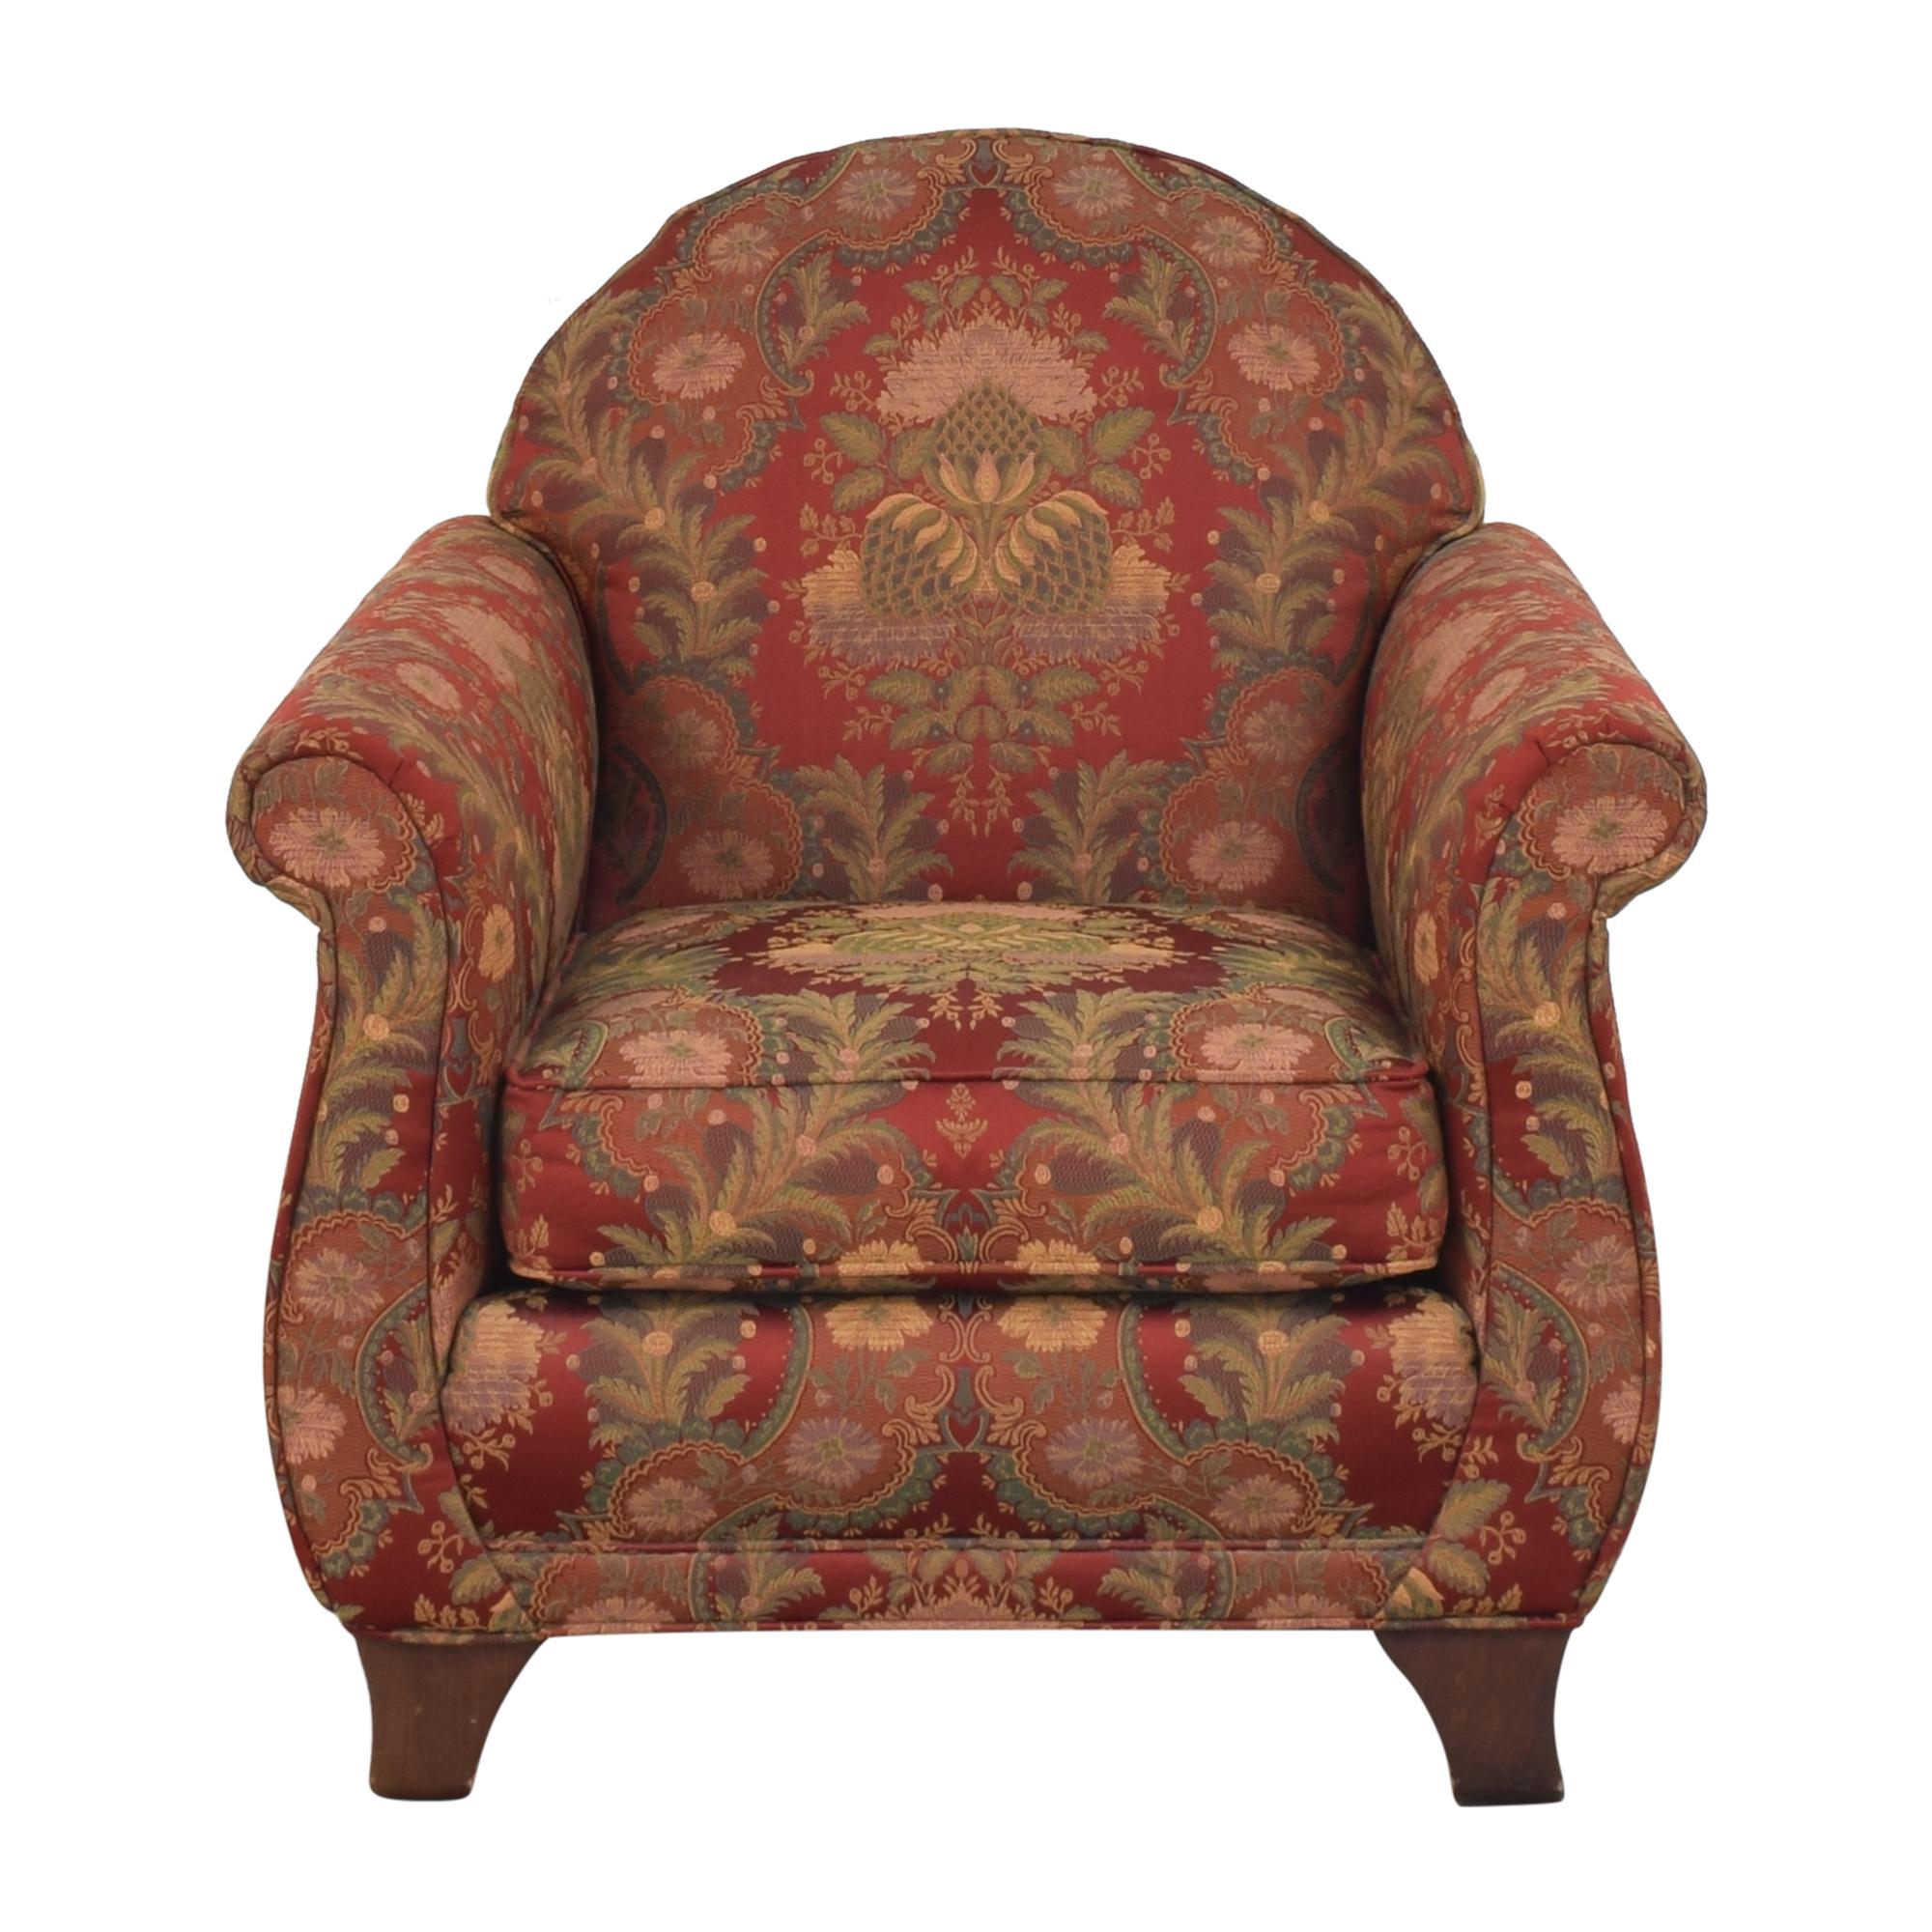 Ethan Allen Ethan Allen Ansonia Chair on sale